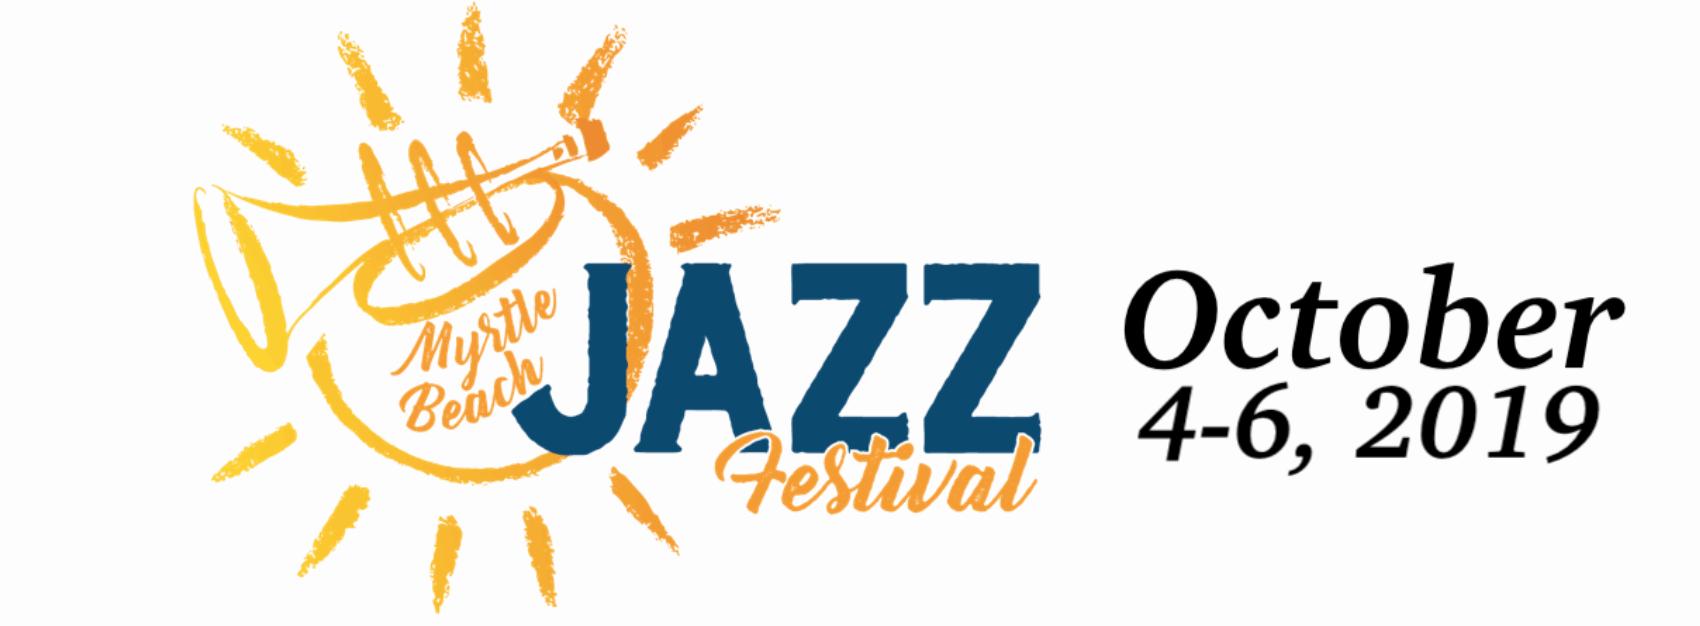 Fourth annual Myrtle Beach Jazz Festival